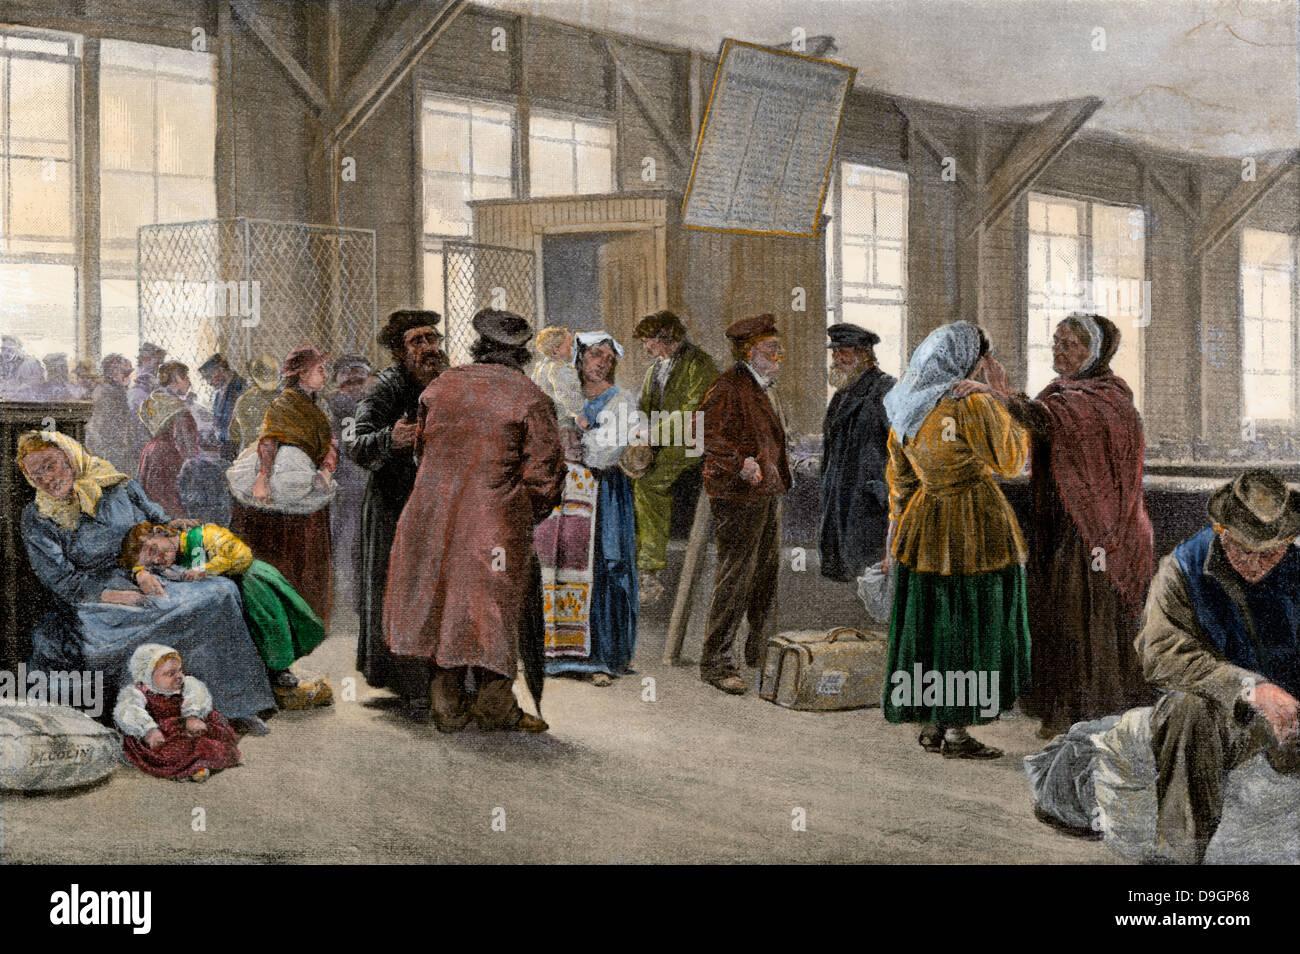 Detained Immigrants Waiting Ellis Island New York Late